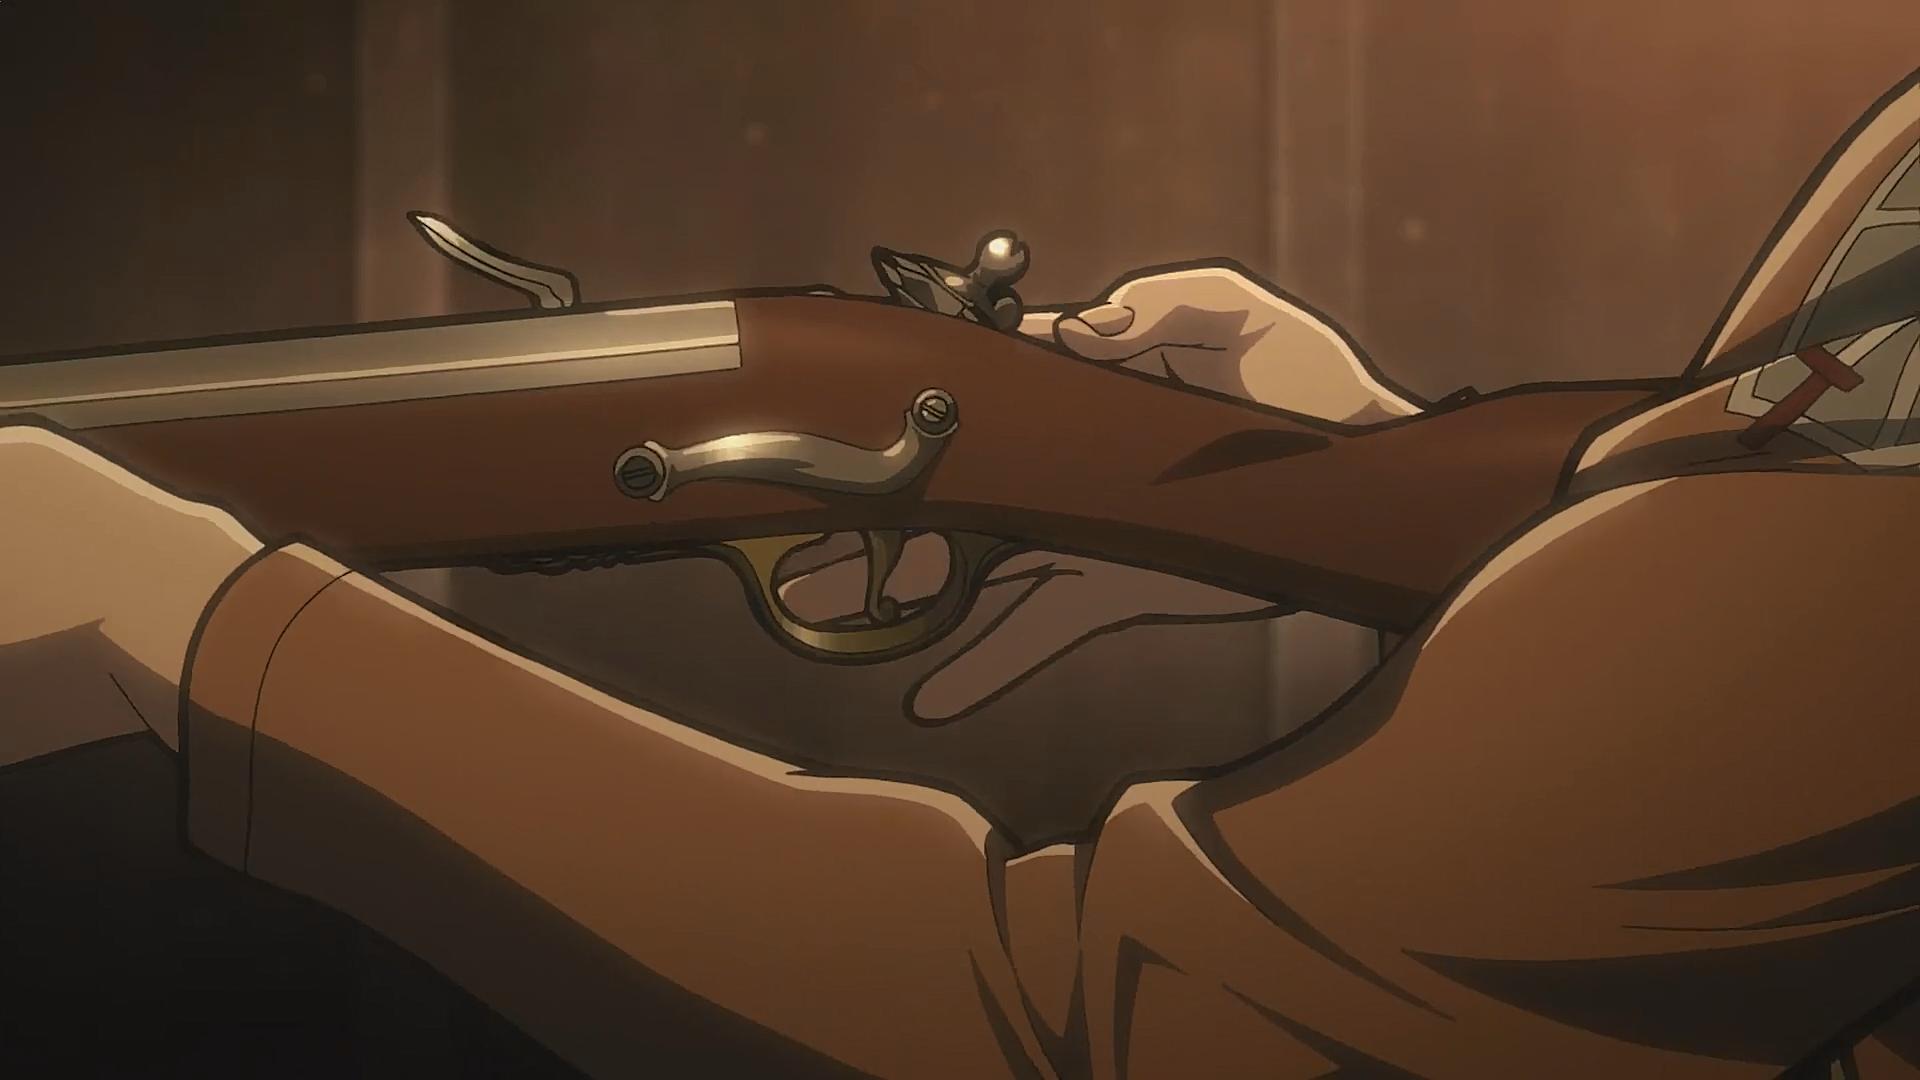 Firearms (Anime)